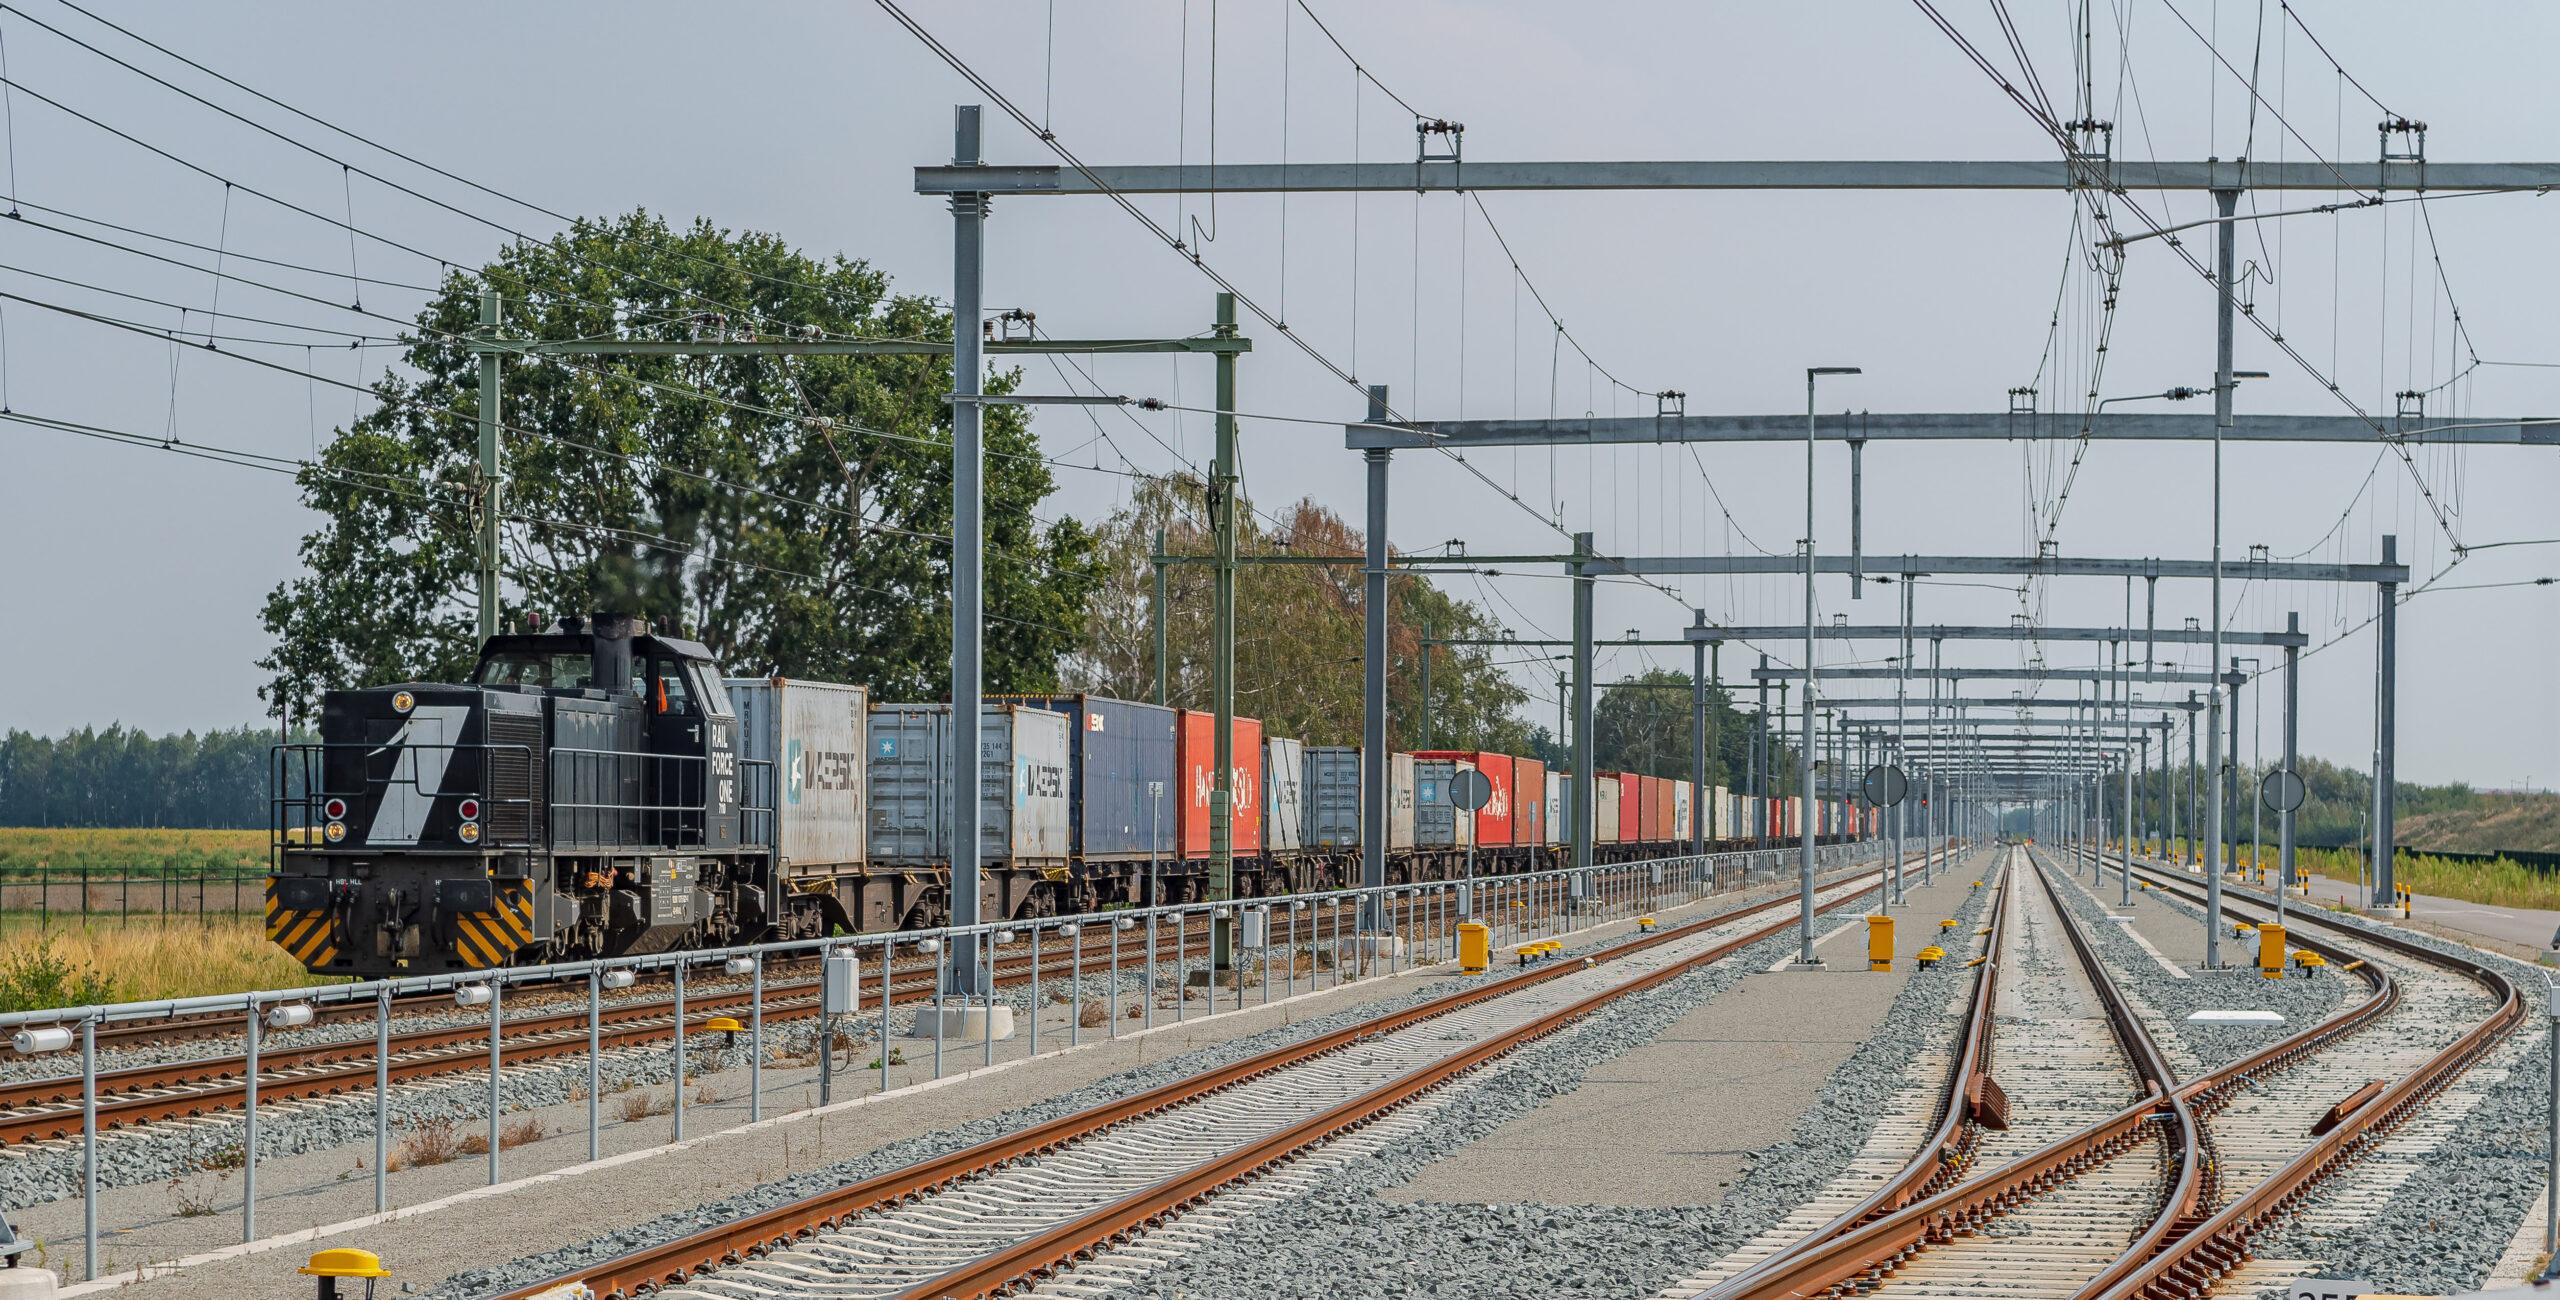 Railterminal Venlo - Jakob Alkema